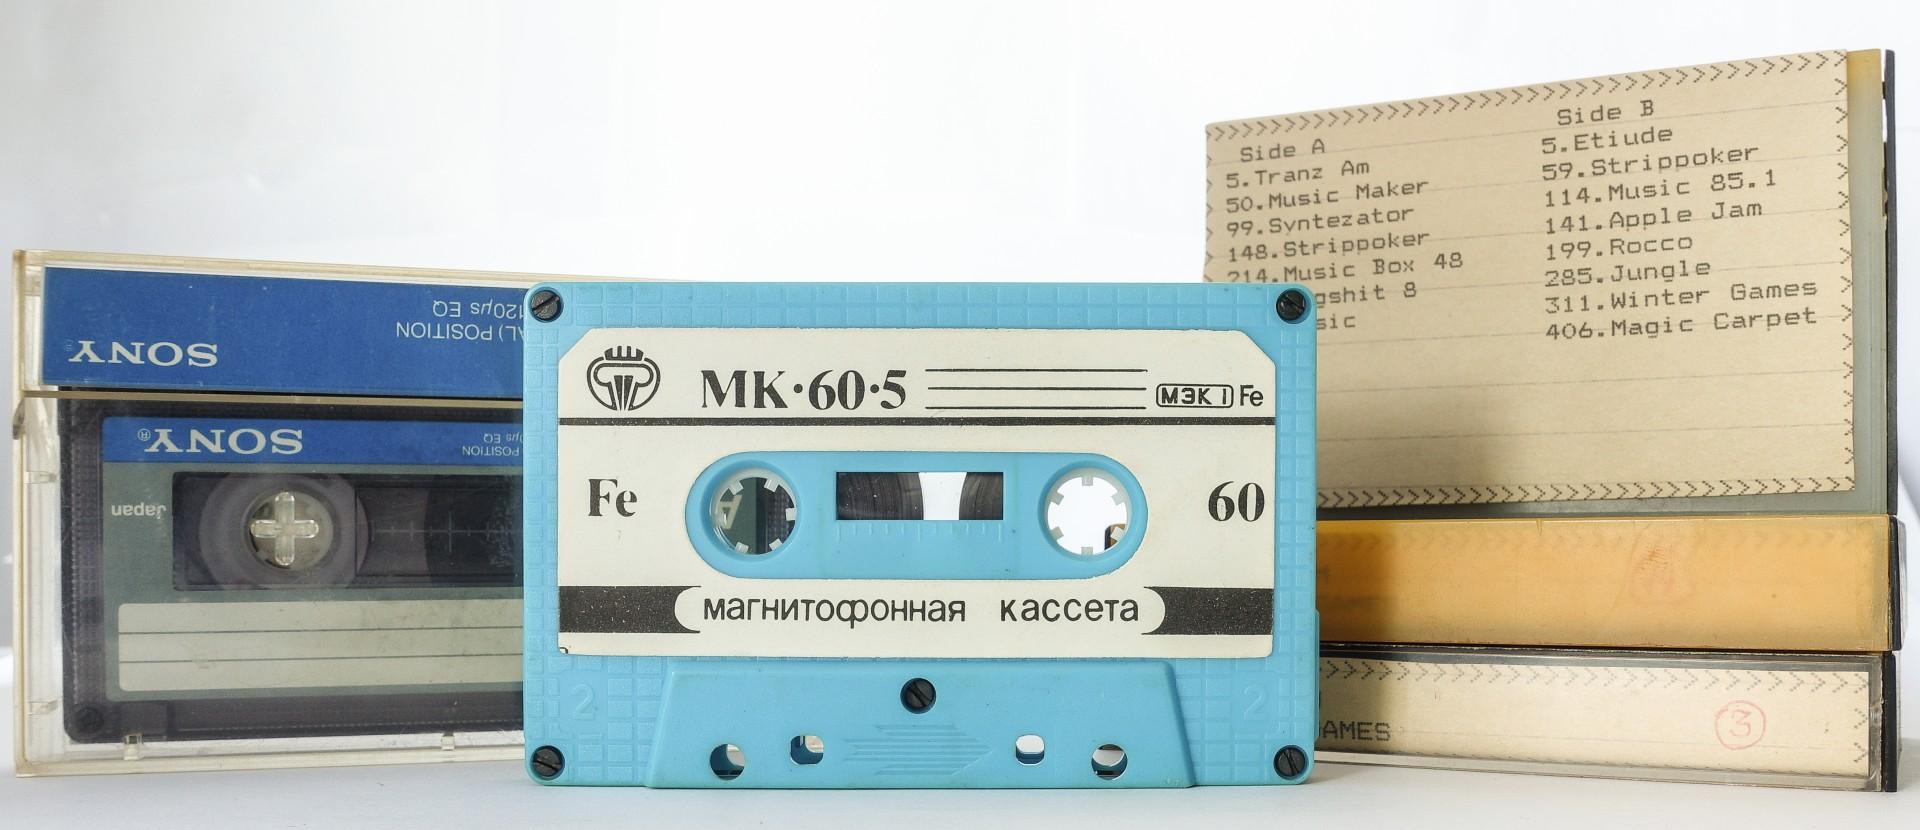 https://zxdemos.ru/uploads/images/2/a753a9d49da81bcfda5a9715e9657a5b.jpeg